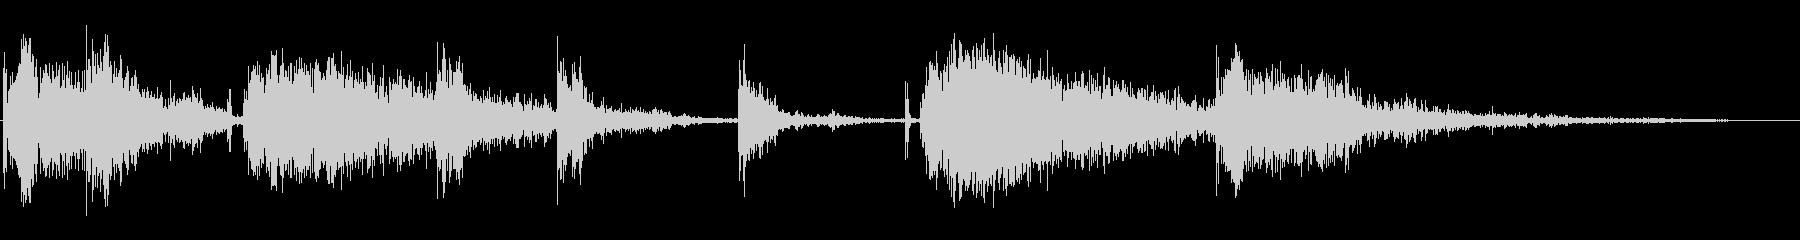 105MM:複数のラウンド、ガンキャノンの未再生の波形